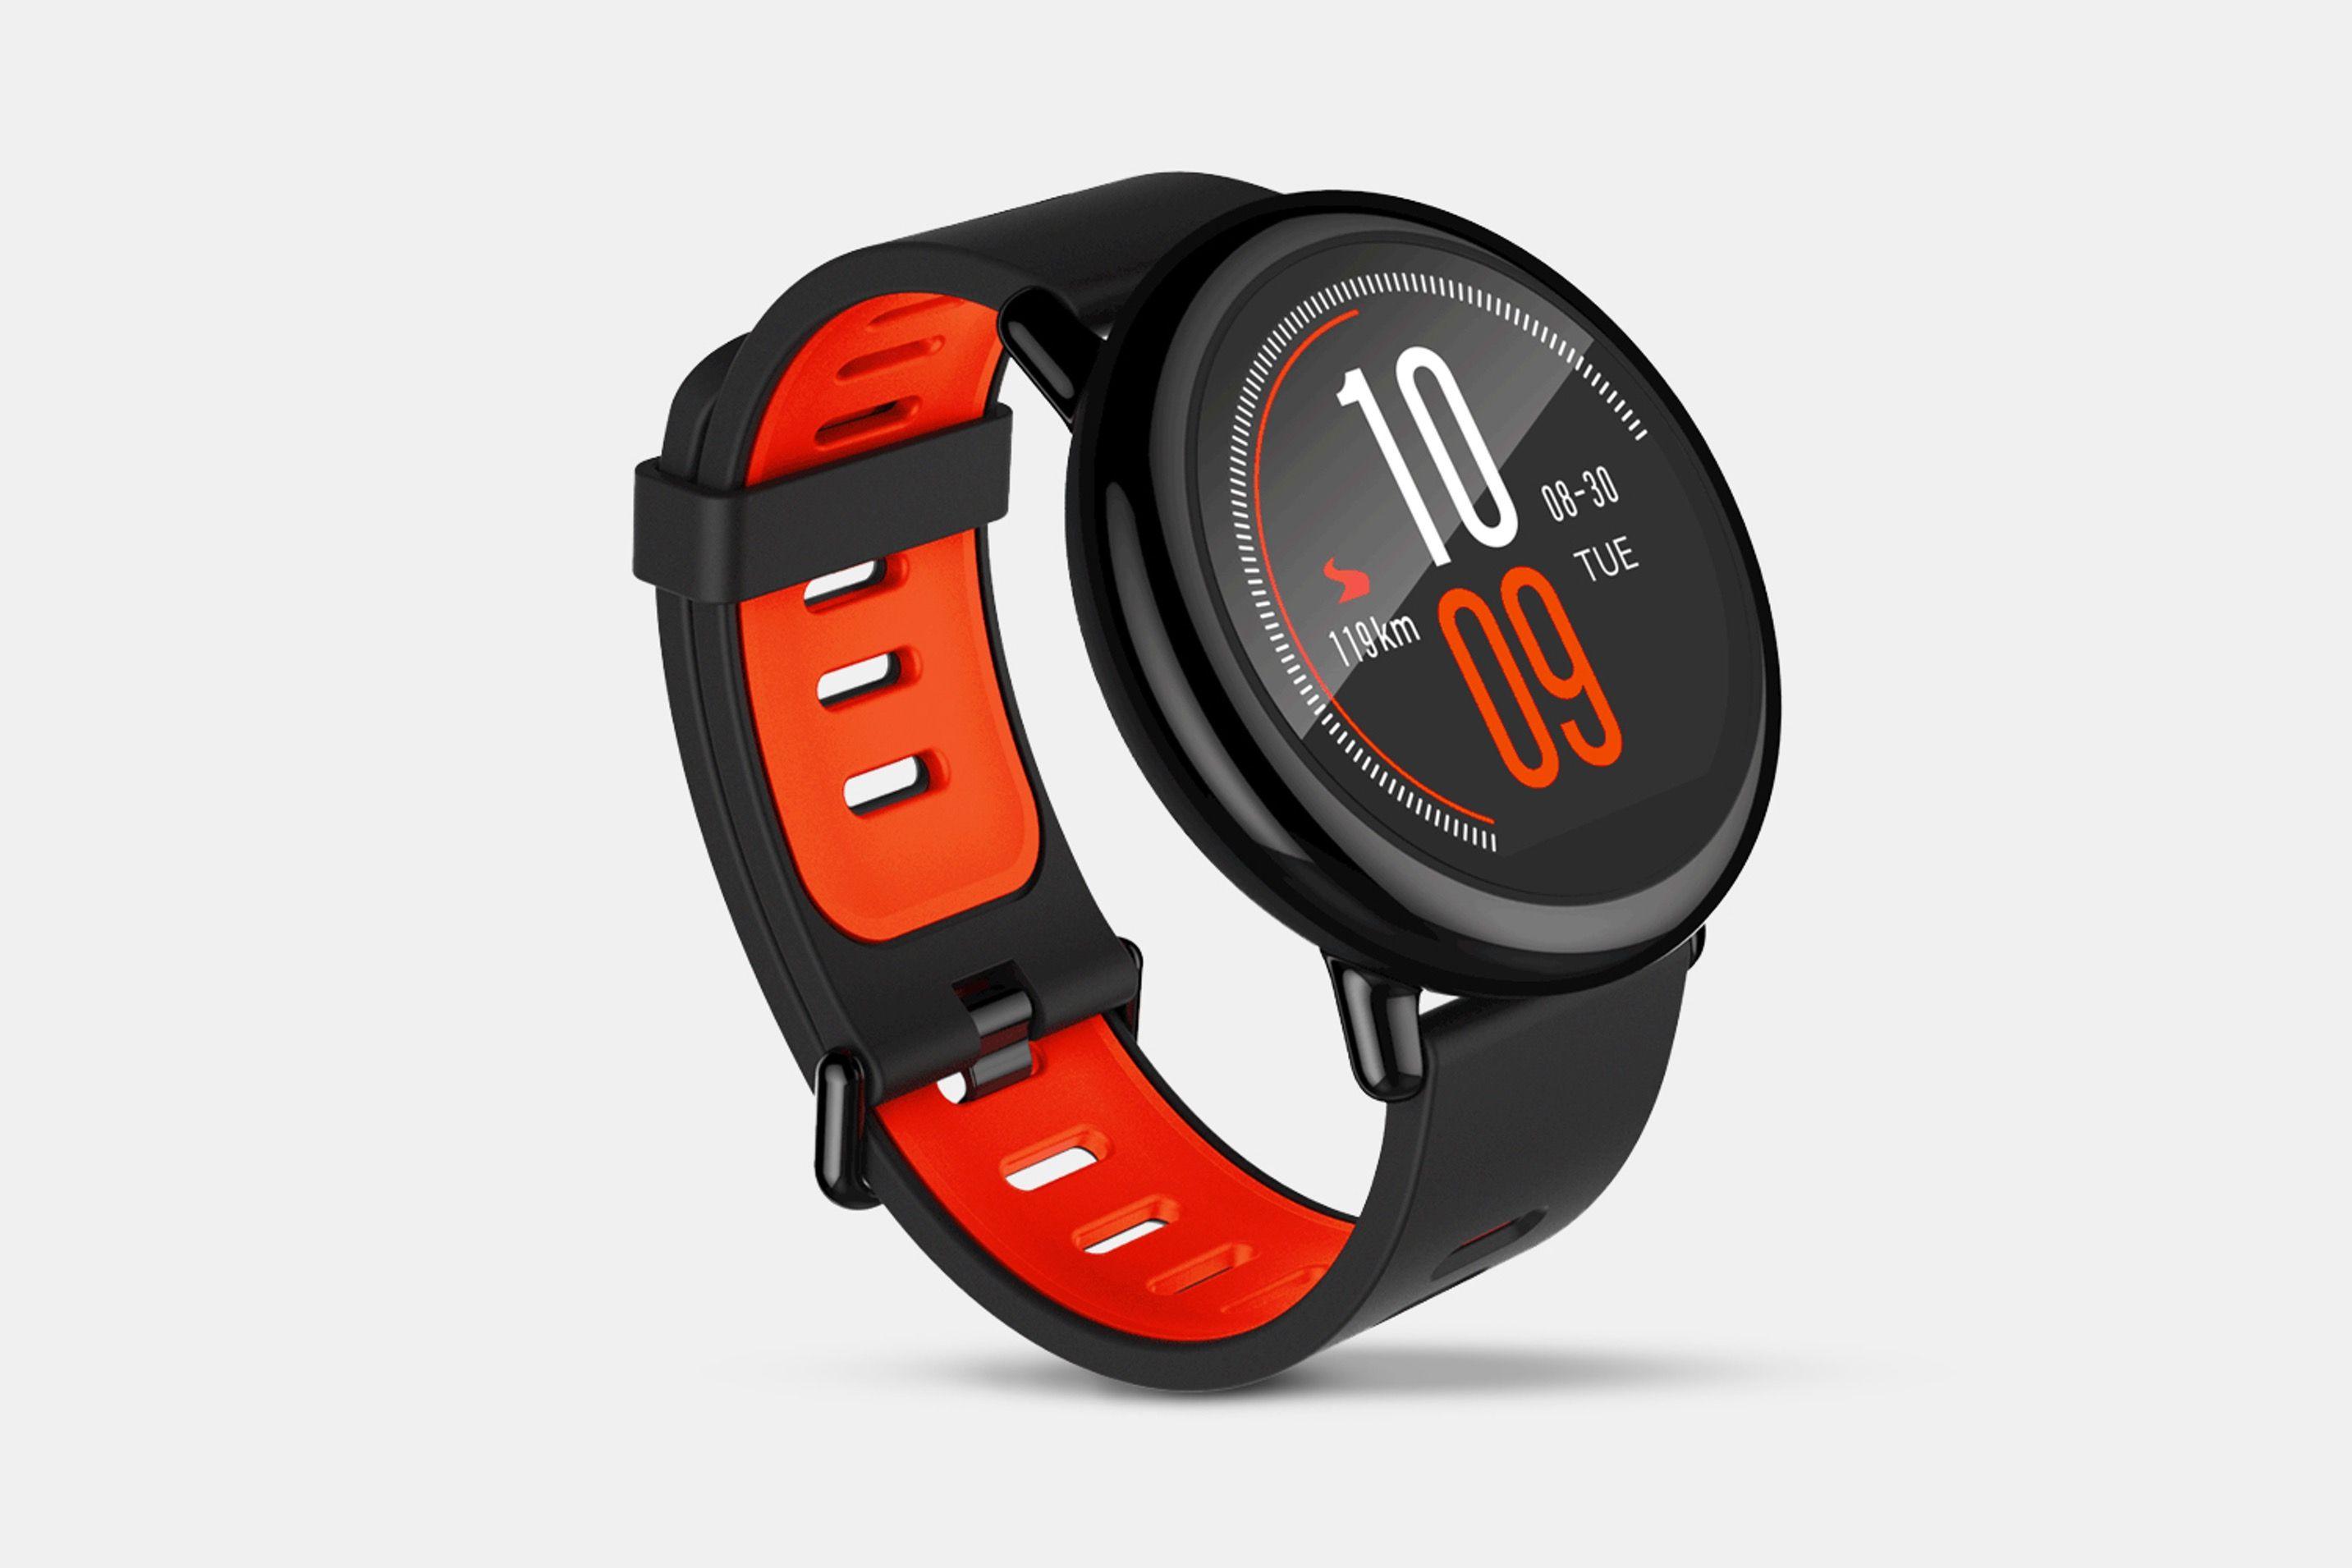 Amazfit pace gps smartwatch now on massdrop for just 119 w wifi 4gb